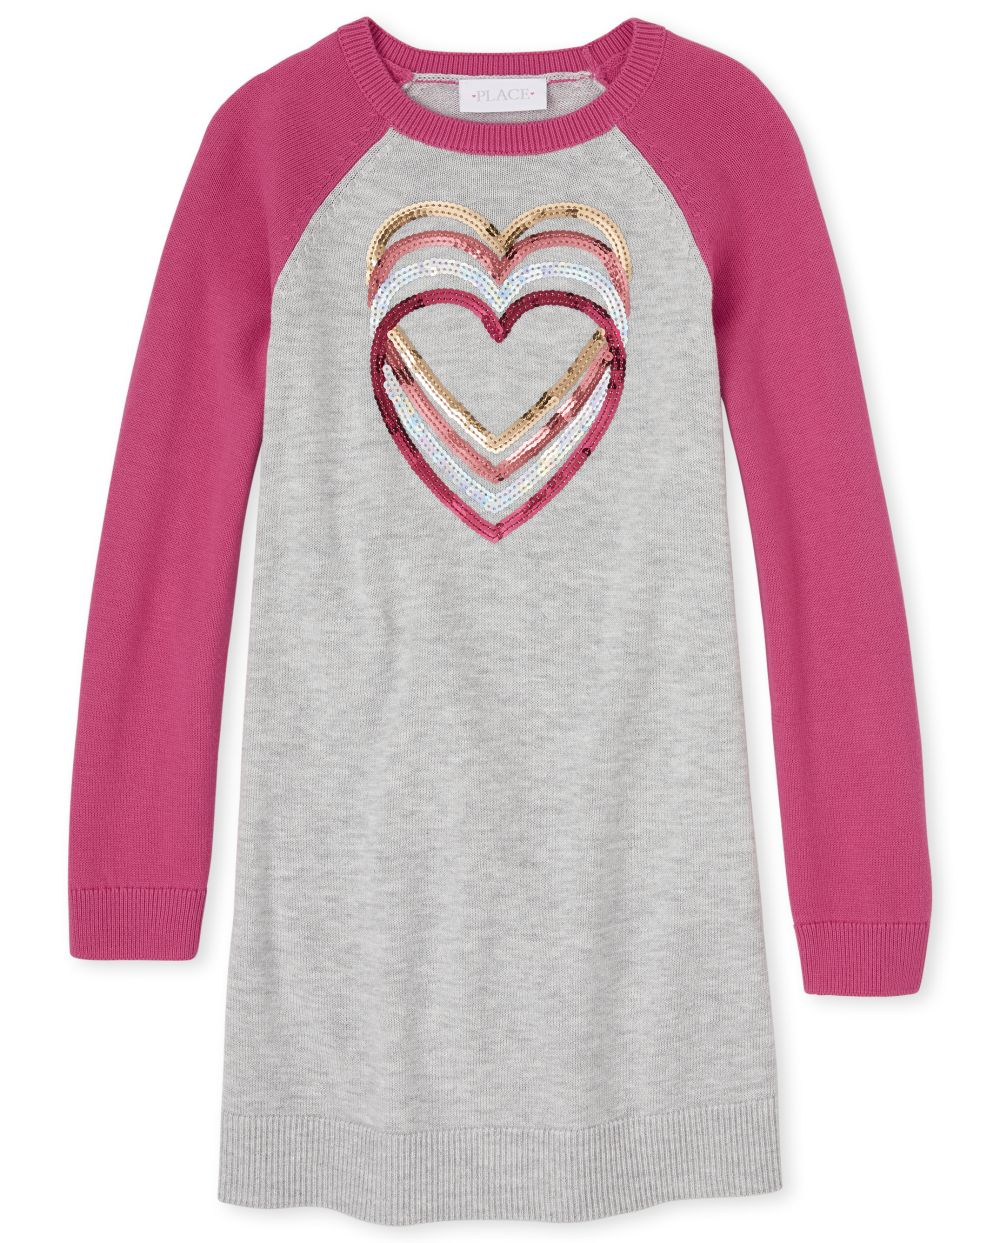 Girls Sweater Raglan Sleeves Dress